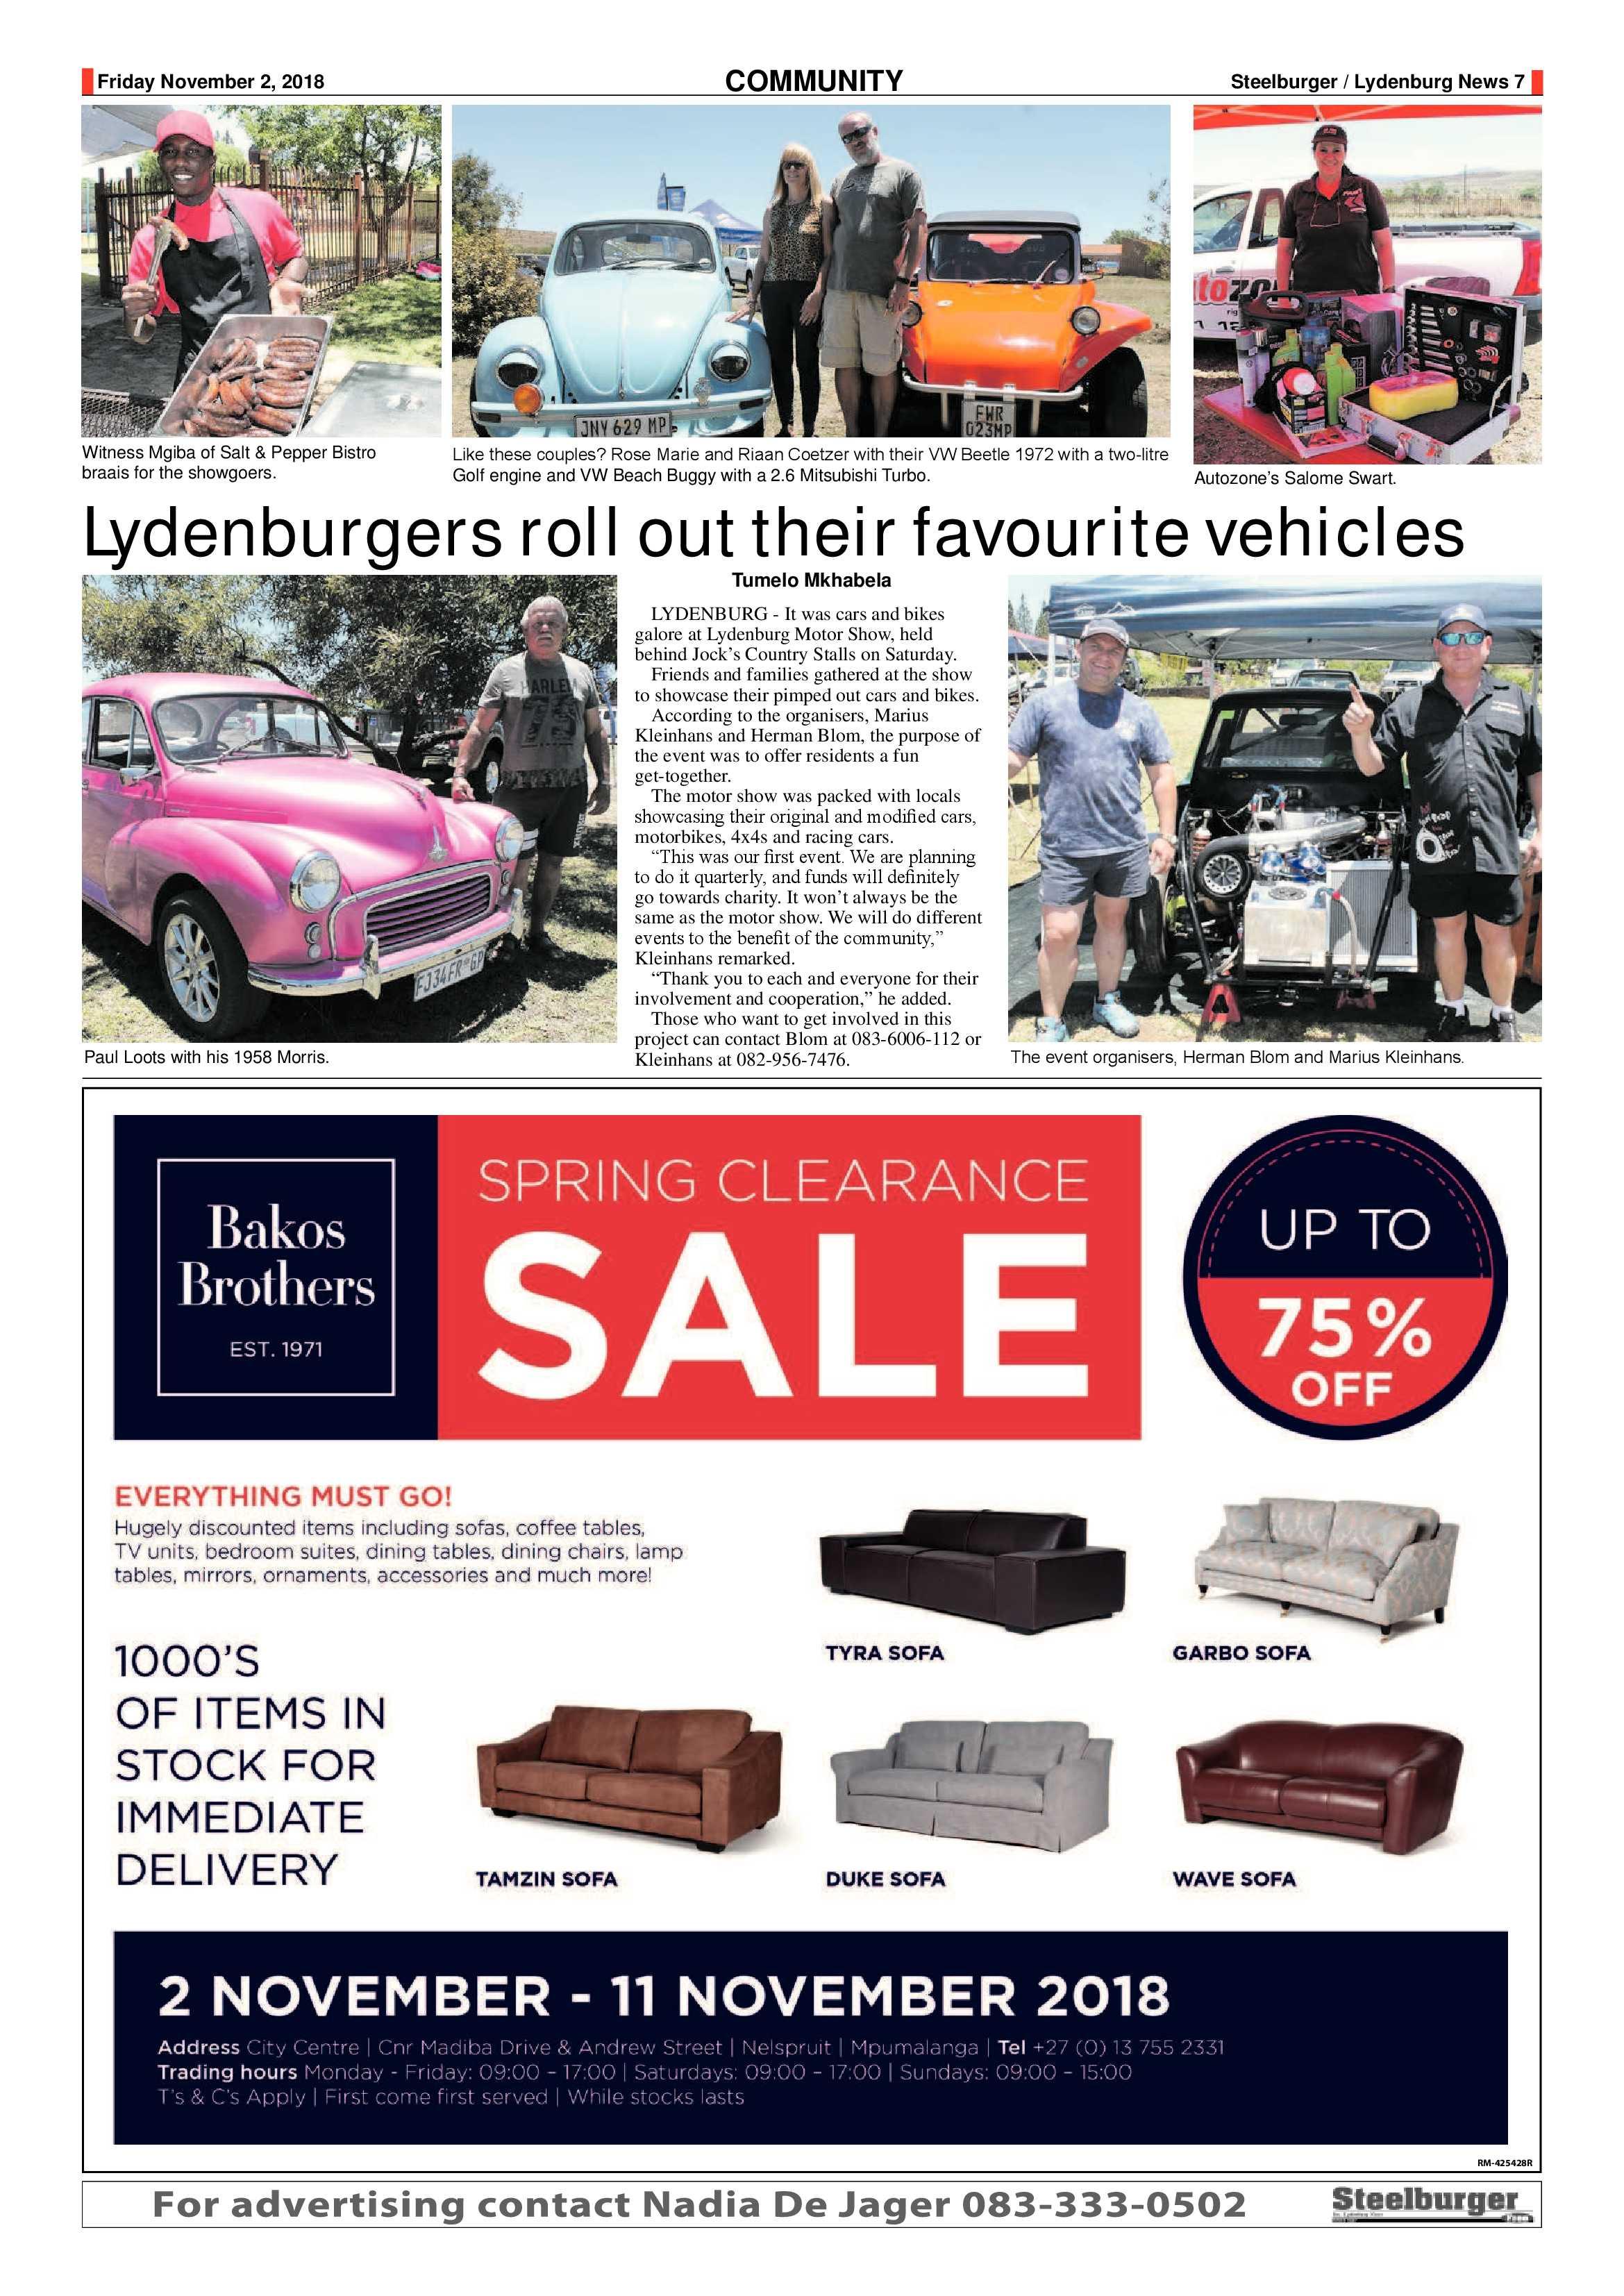 steelburger-news-2-november-2018-epapers-page-7